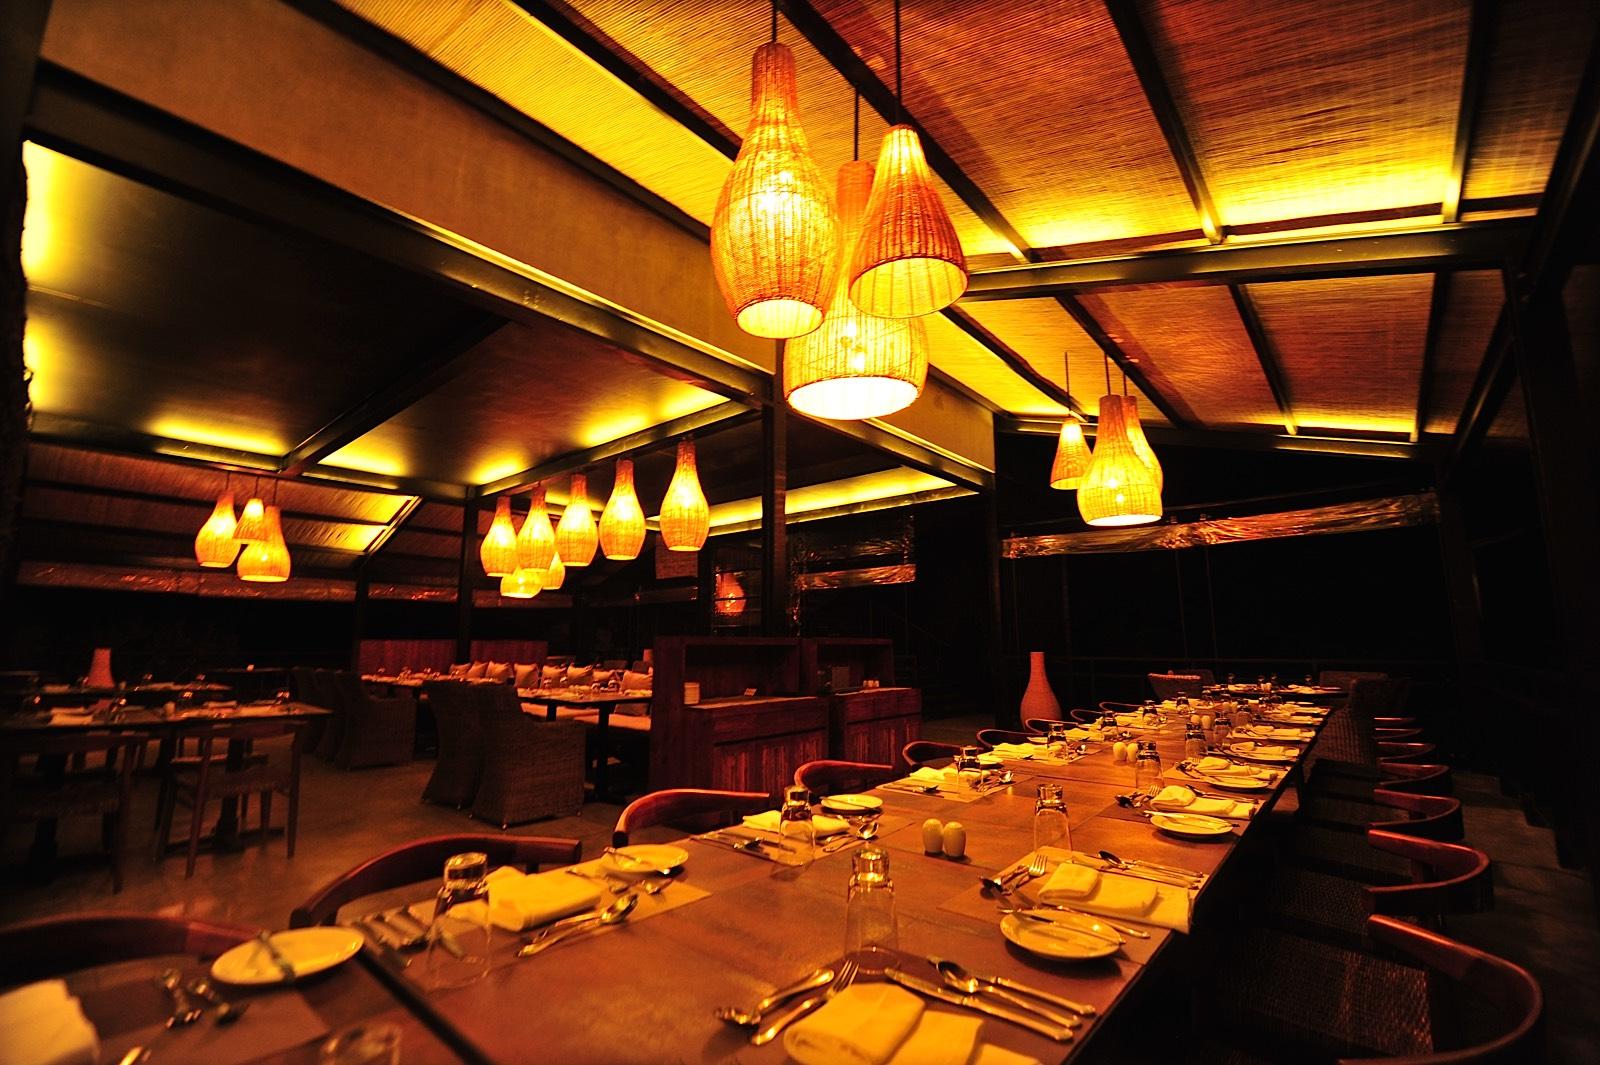 invite-to-paradise-holiday-honeymoon-sri-lanka-specialists-safari-lodge-cinnamon-wild-hotel-6.jpg